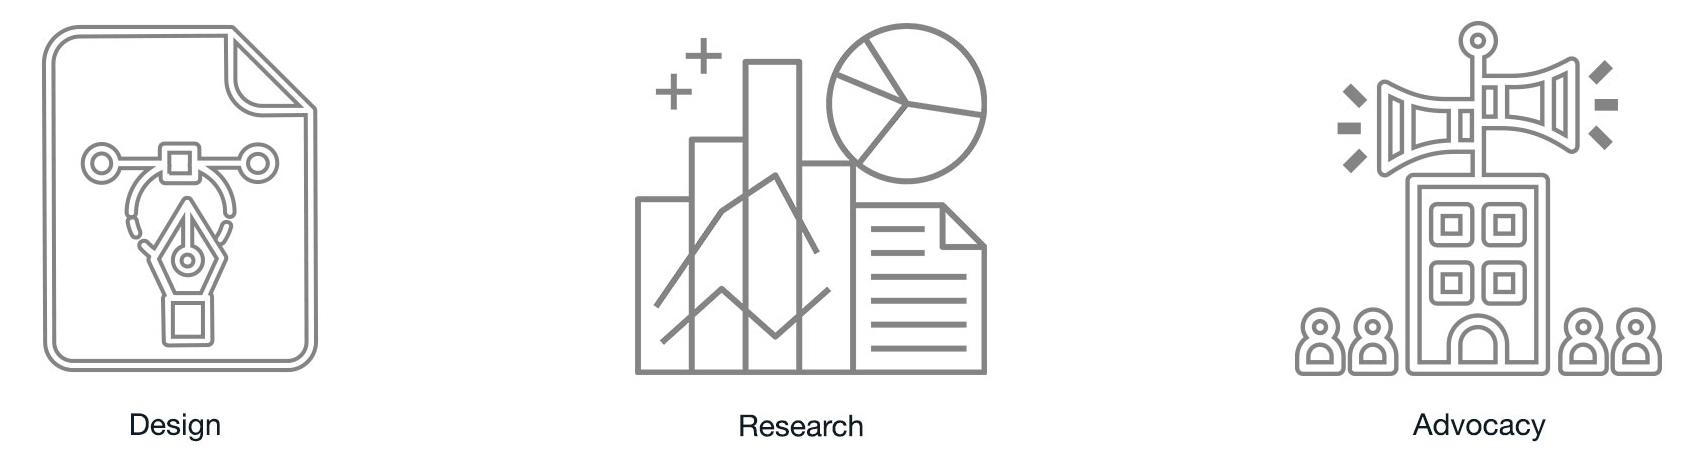 Research-Advocacy-Design.jpg